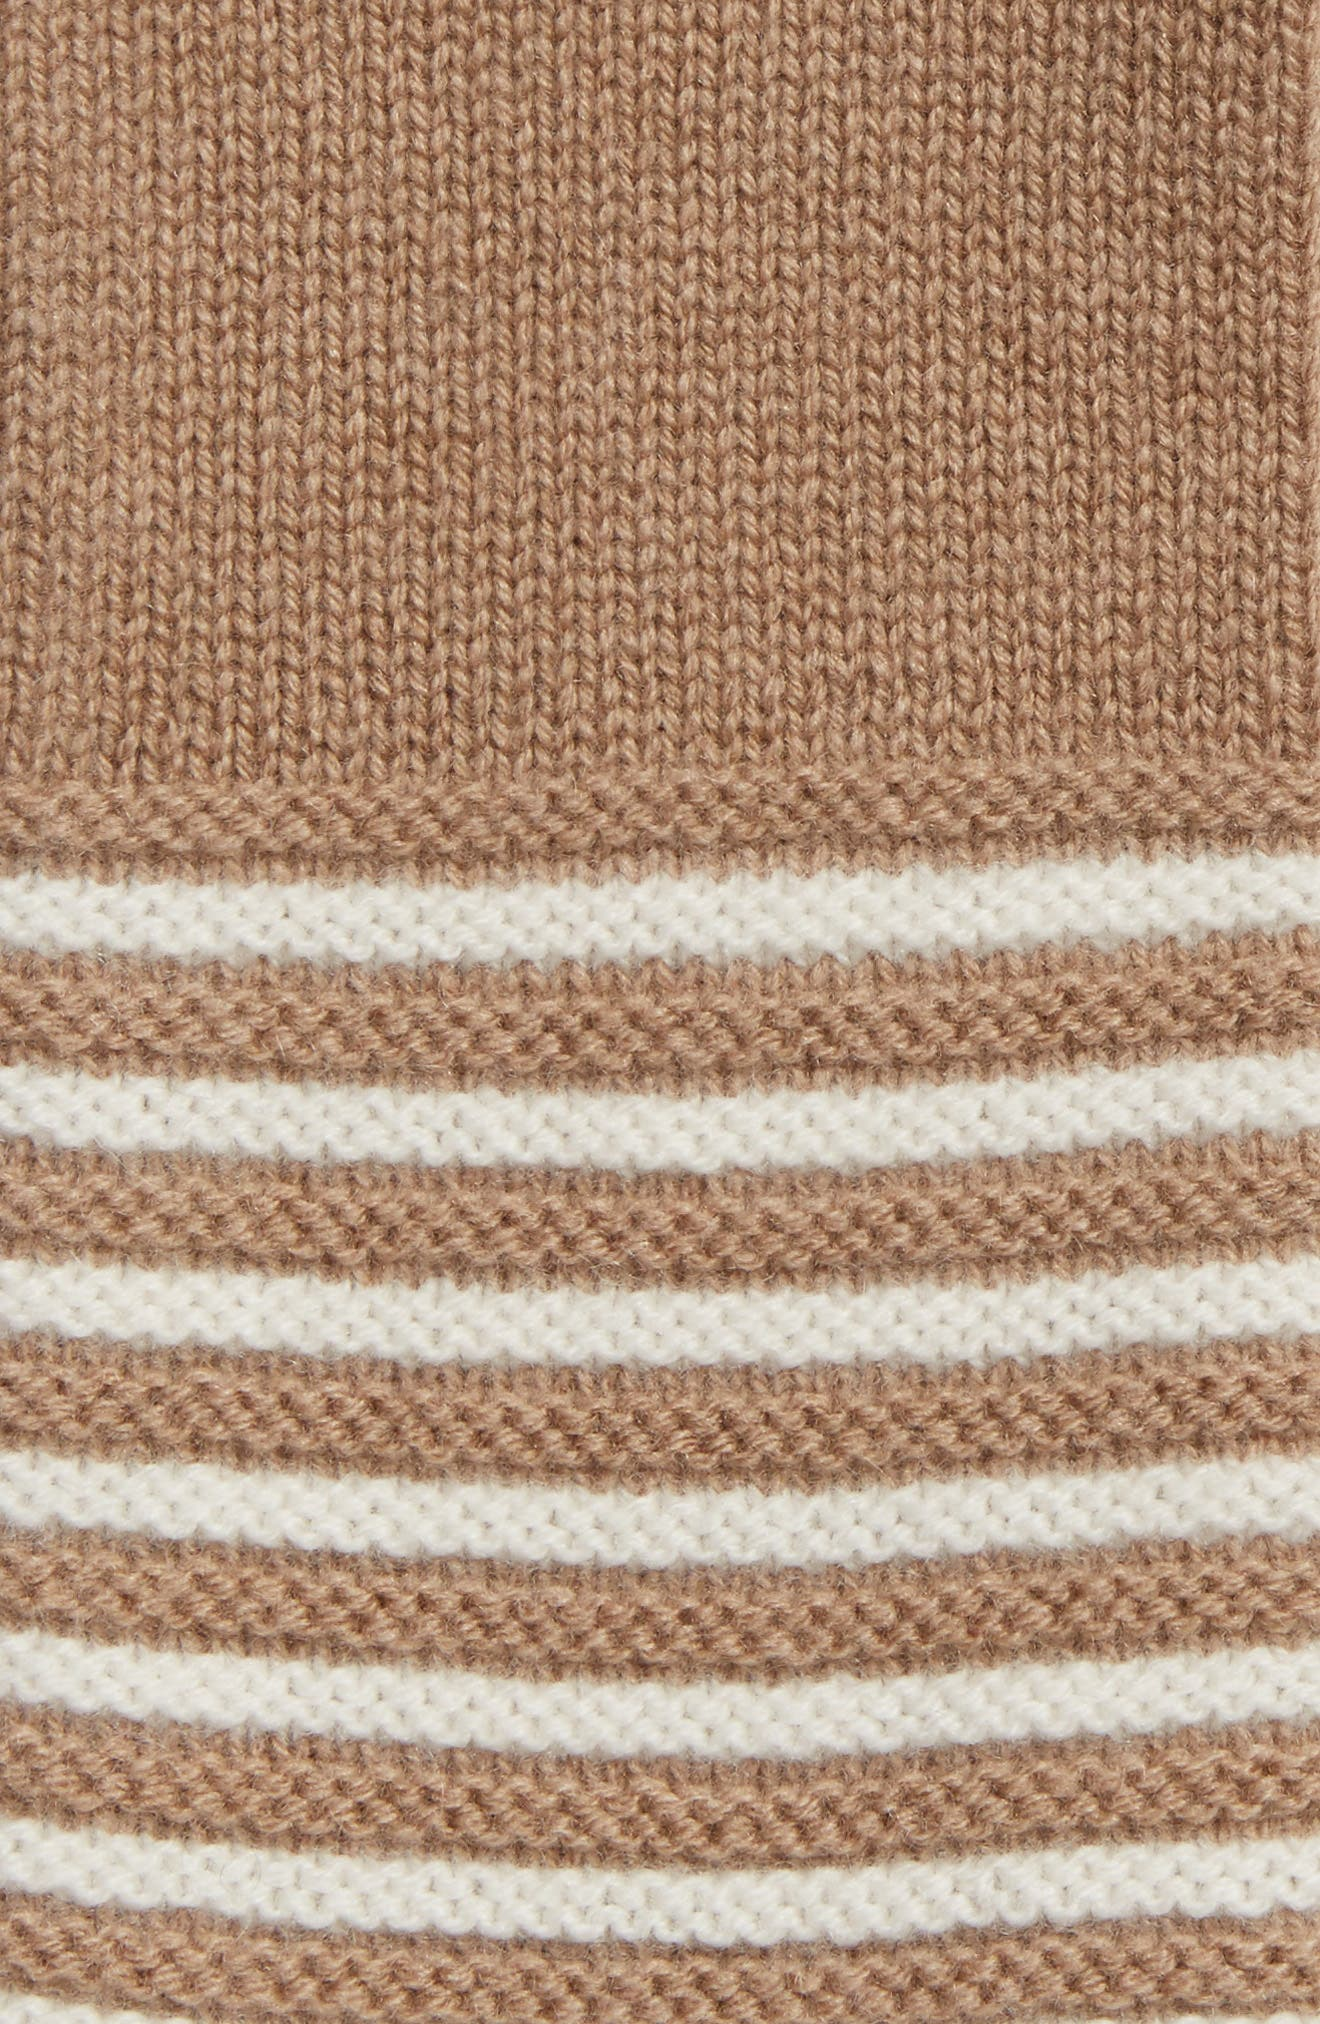 Double Links Wool & Cashmere Gloves,                             Alternate thumbnail 2, color,                             Dark Camel/ Cream